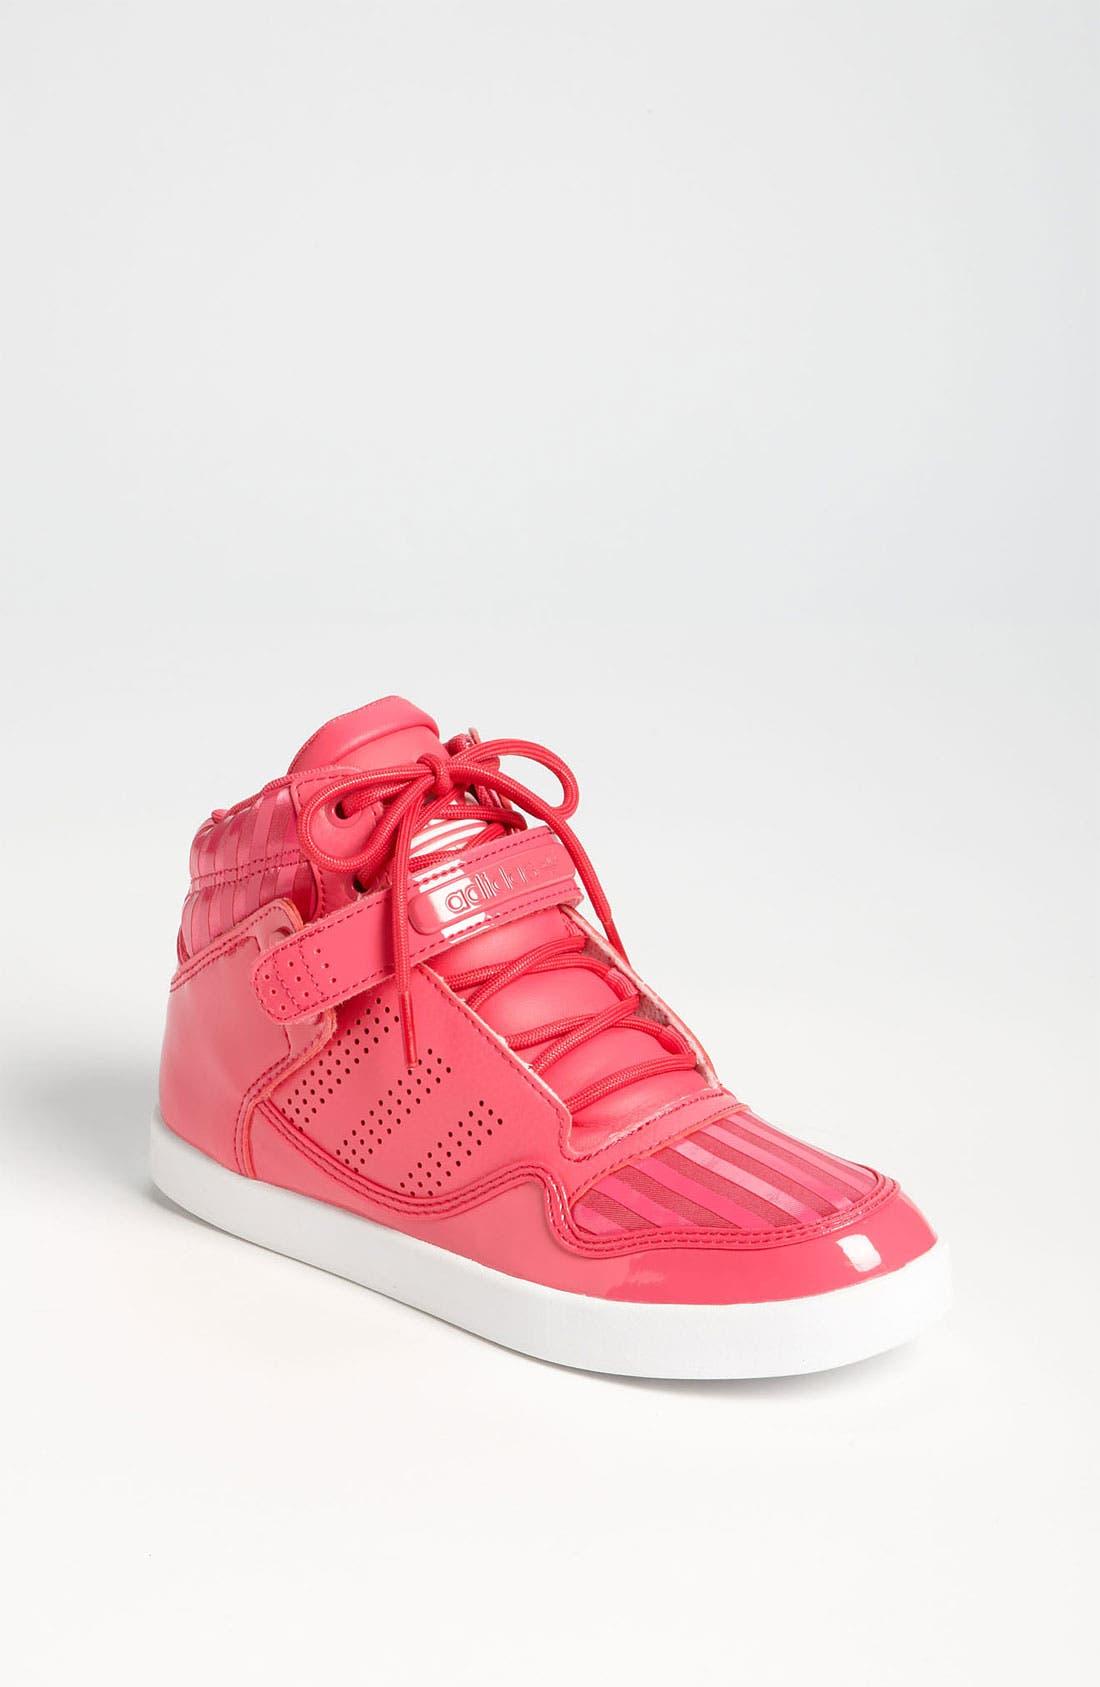 Alternate Image 1 Selected - adidas 'AR 2.0' Sneaker (Big Kid)